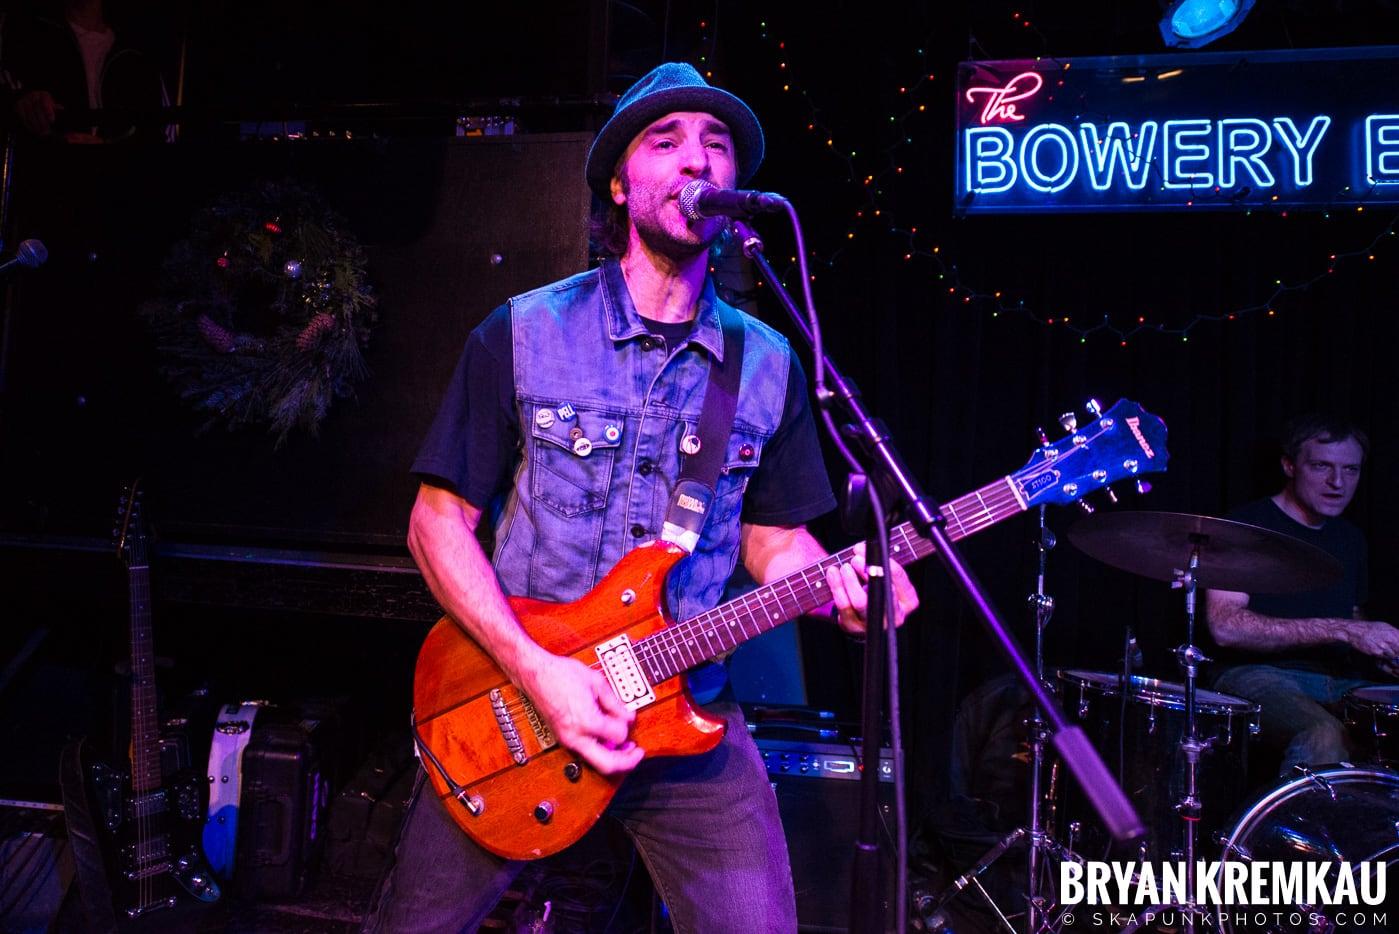 Cenzo @ Bowery Electric, NYC - 11.17.18 (36)